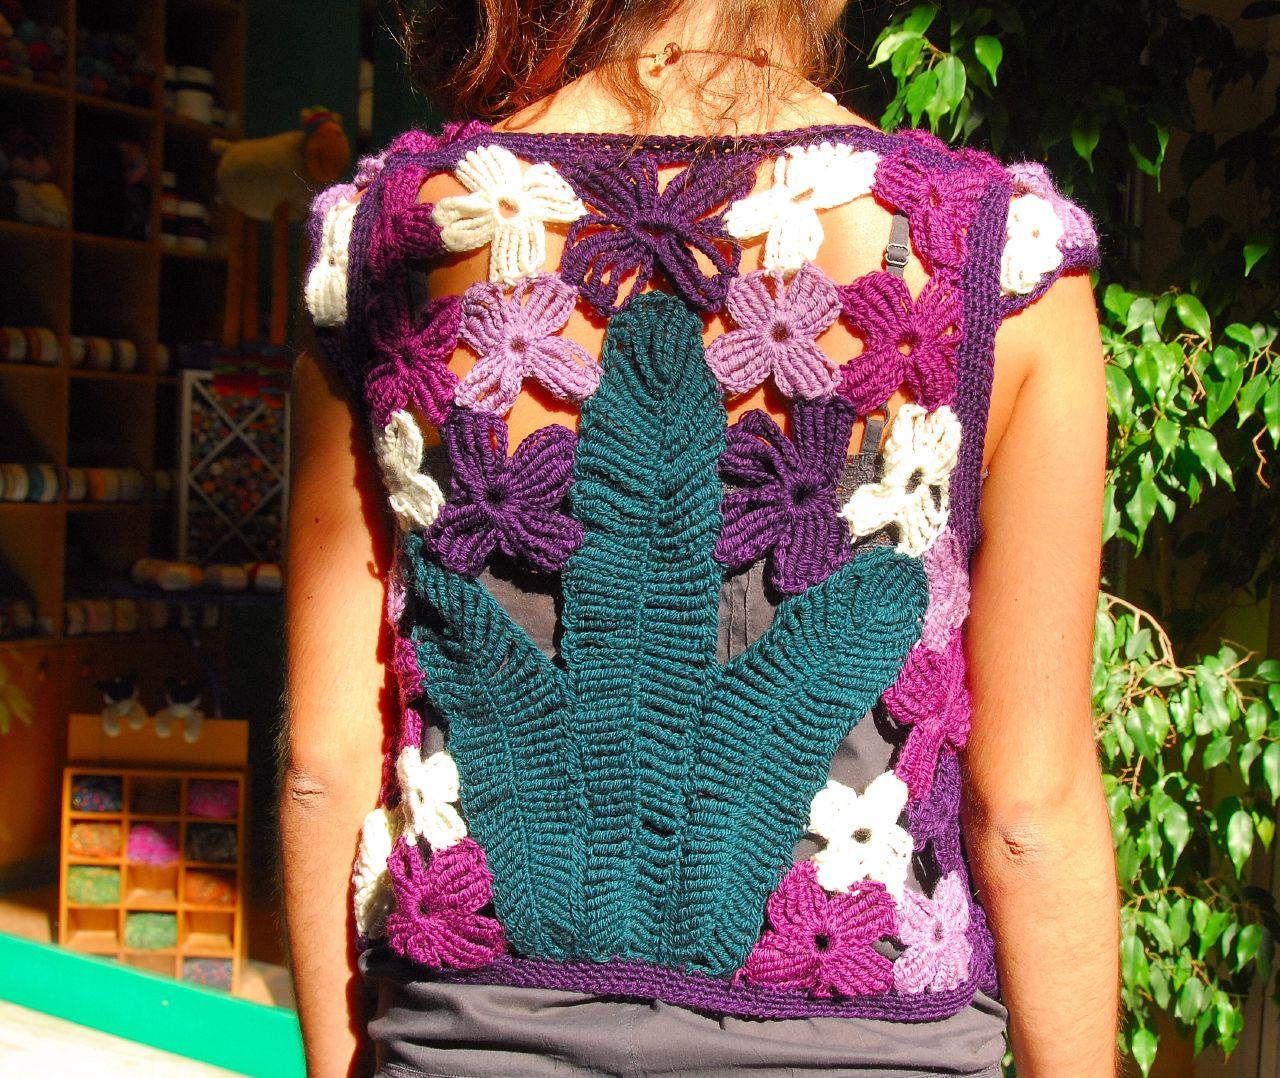 Hintergrundbilder : lila, Panzer, Muster, Sweatshirt, Griechenland ...